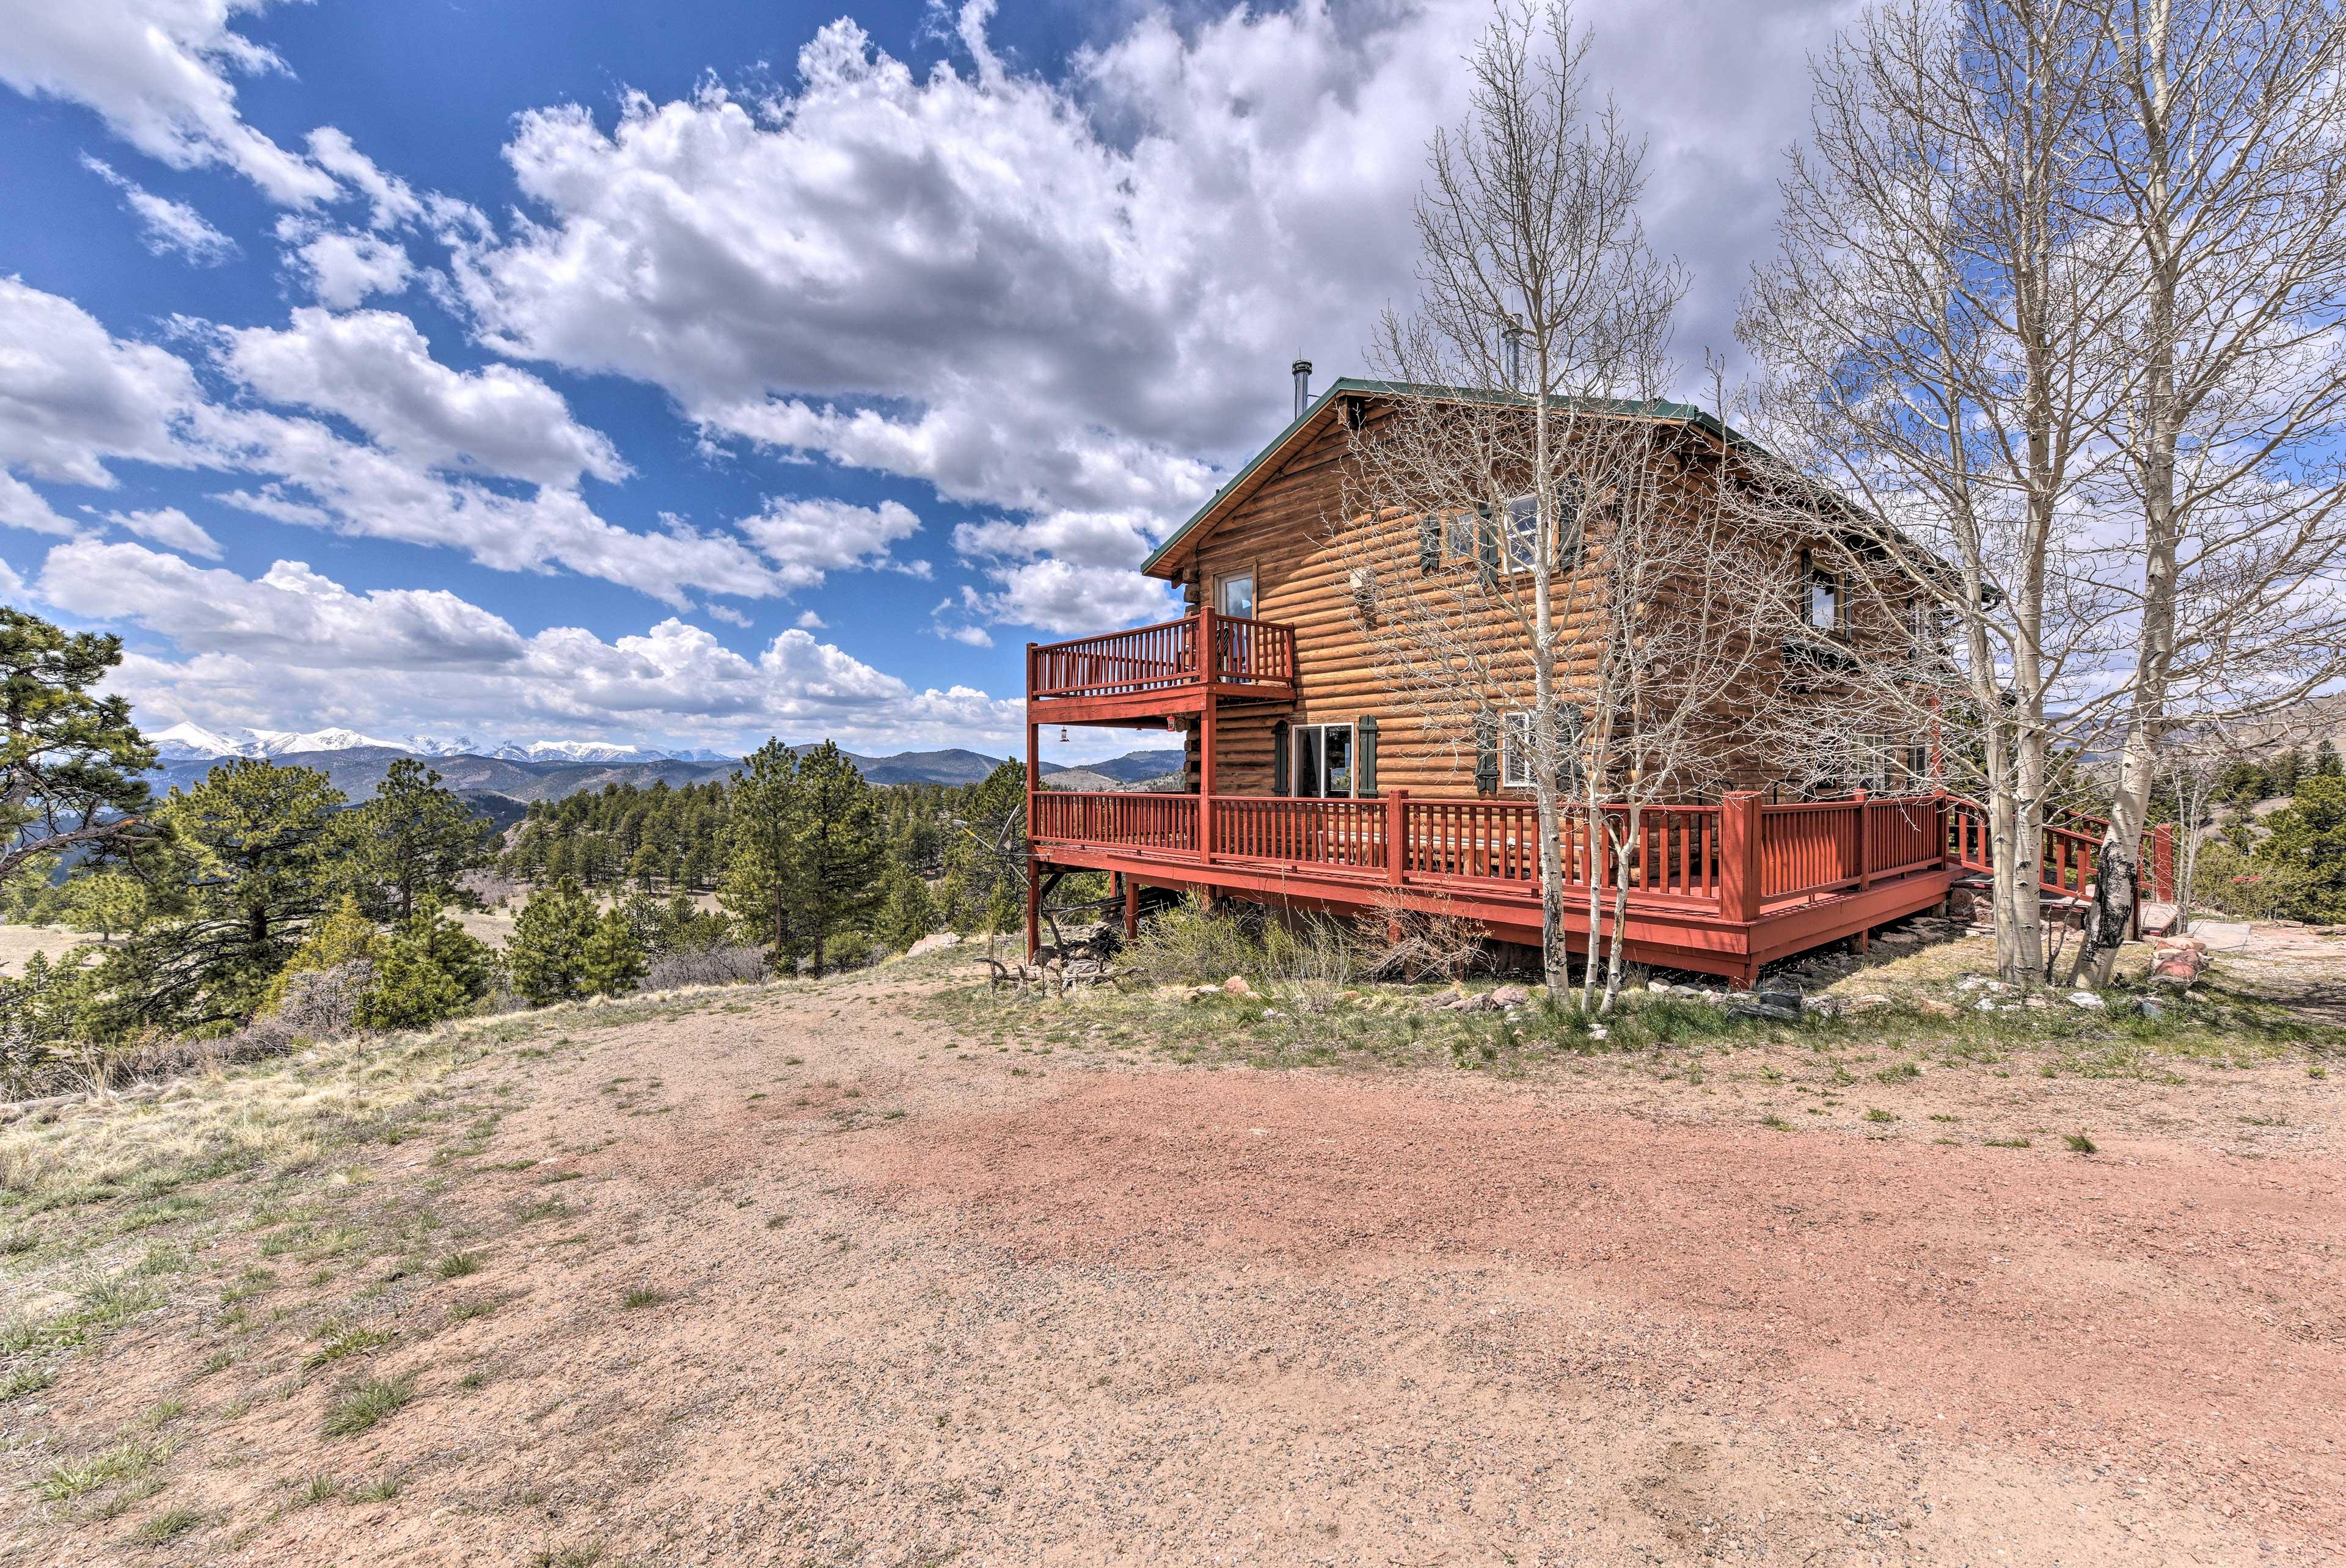 Gorgeous views of the Sange De Cristo mountains surround this charming cabin.